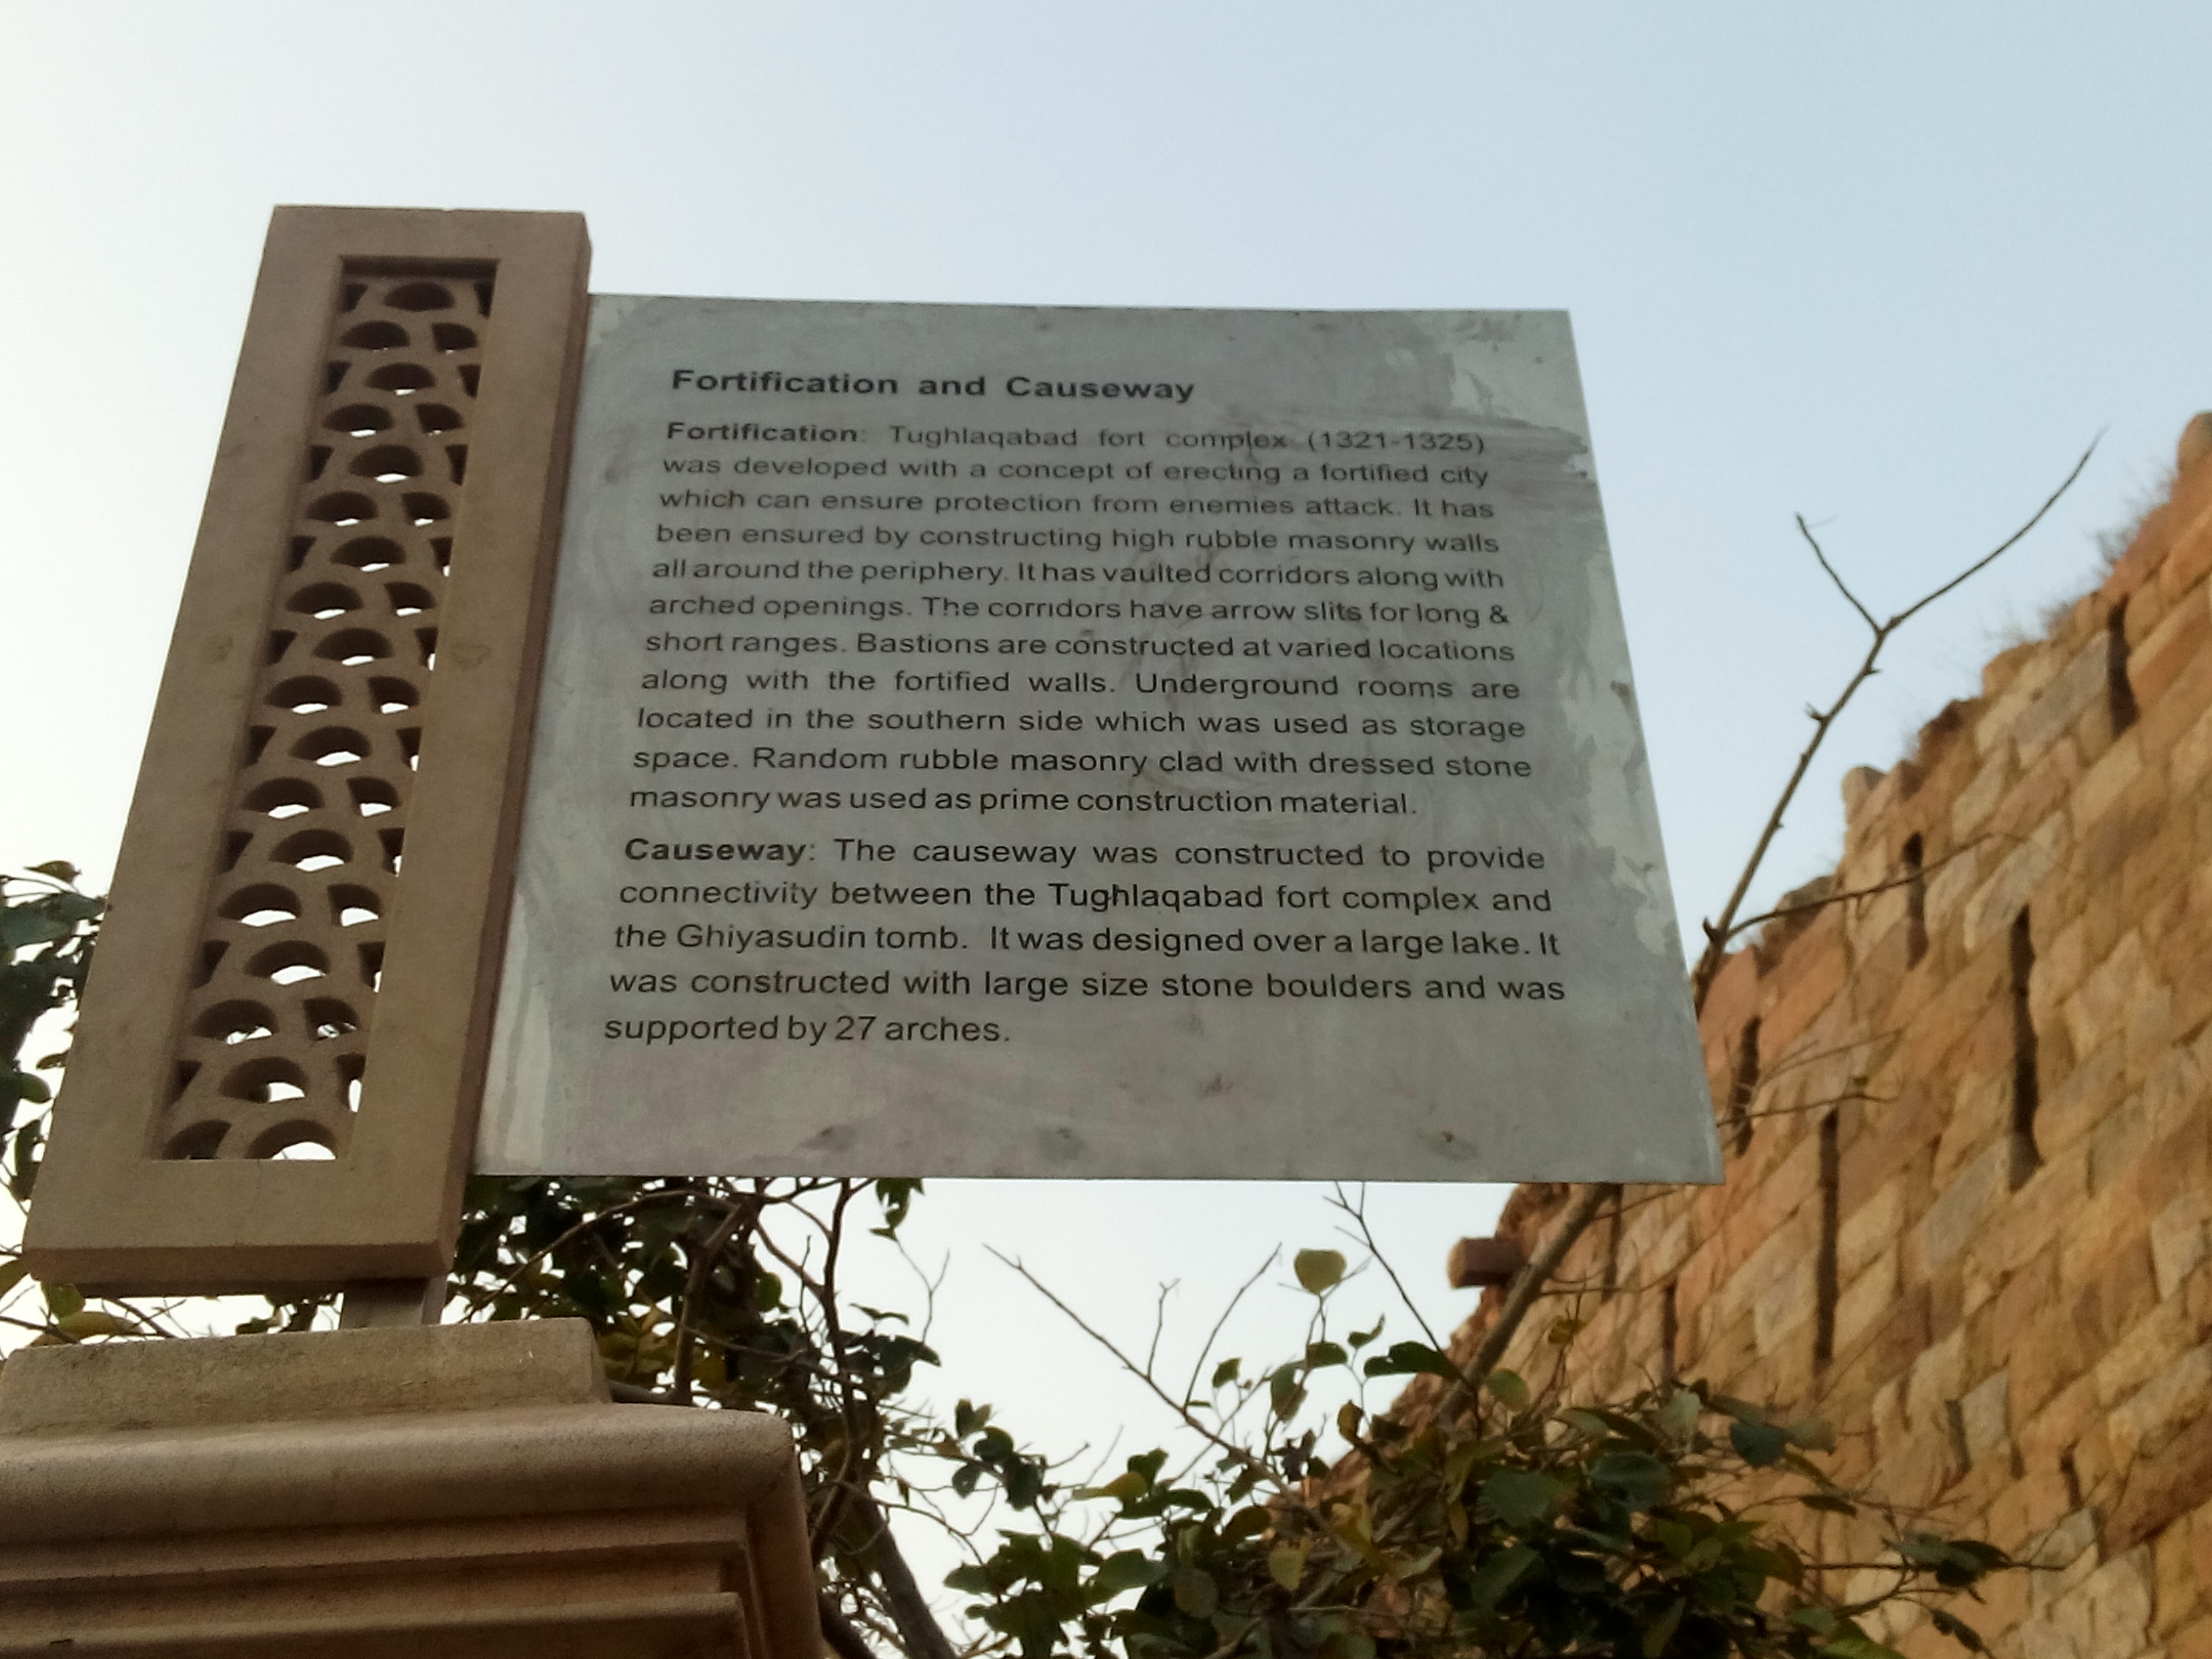 Board outside Tughlaqabad Fort